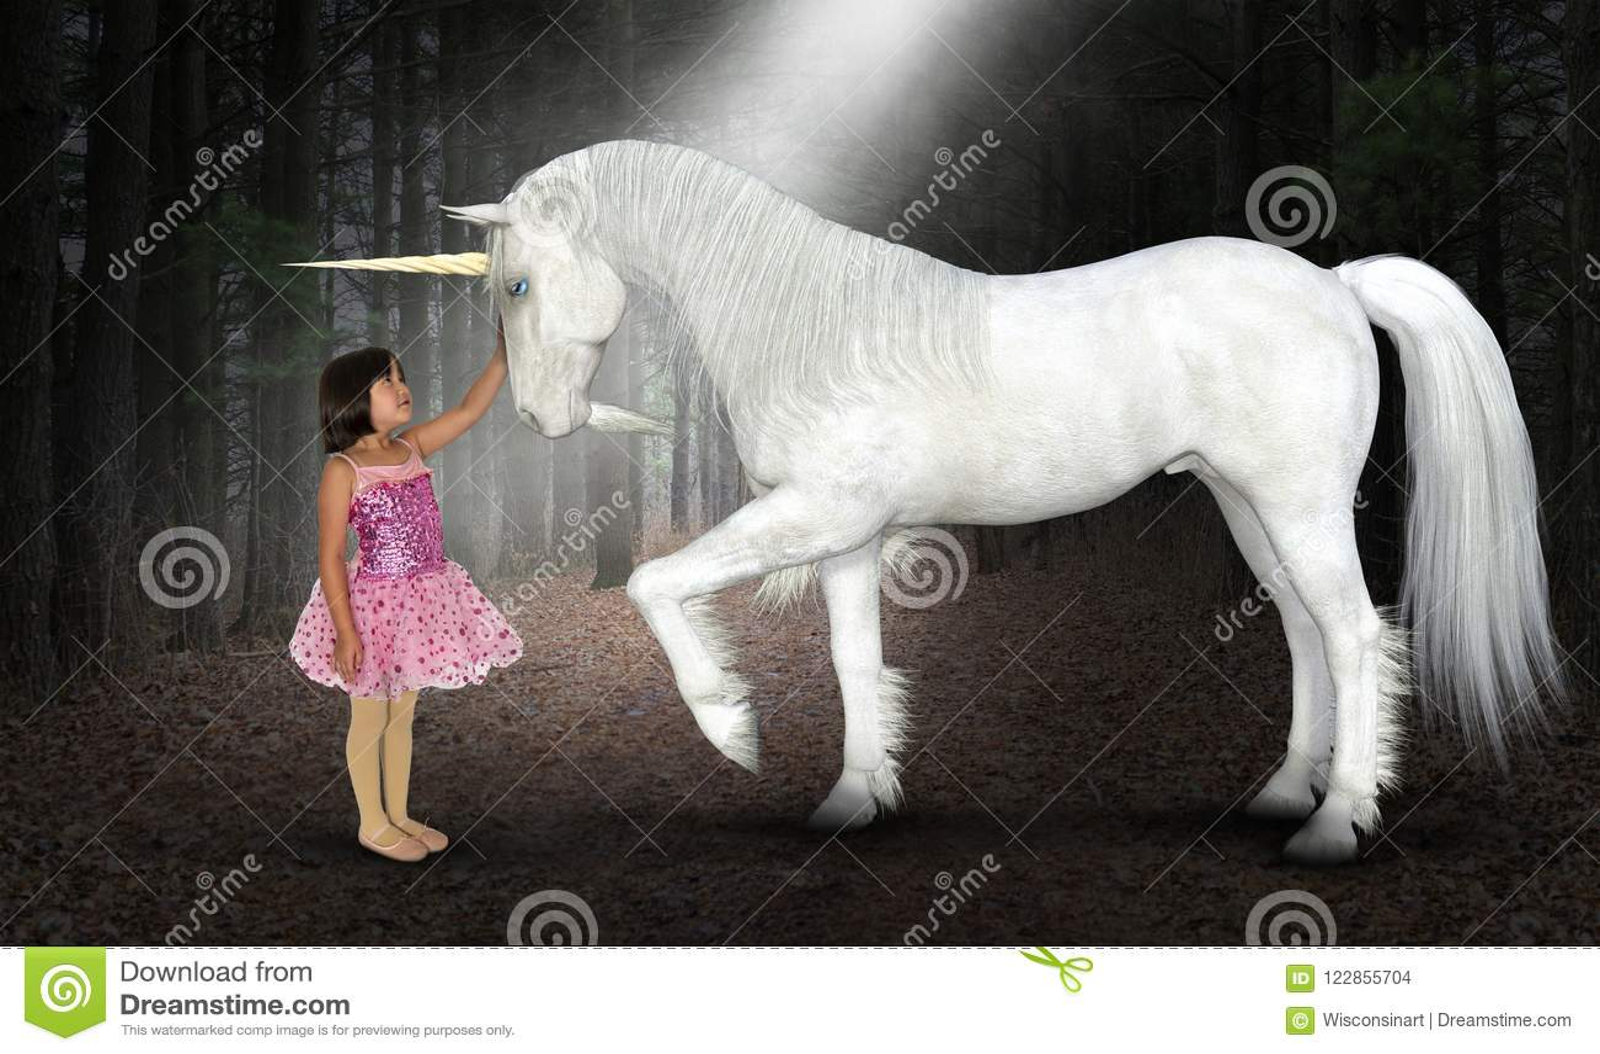 Girl, Peace, Hope, Love, Nature, Unicorn, Woods